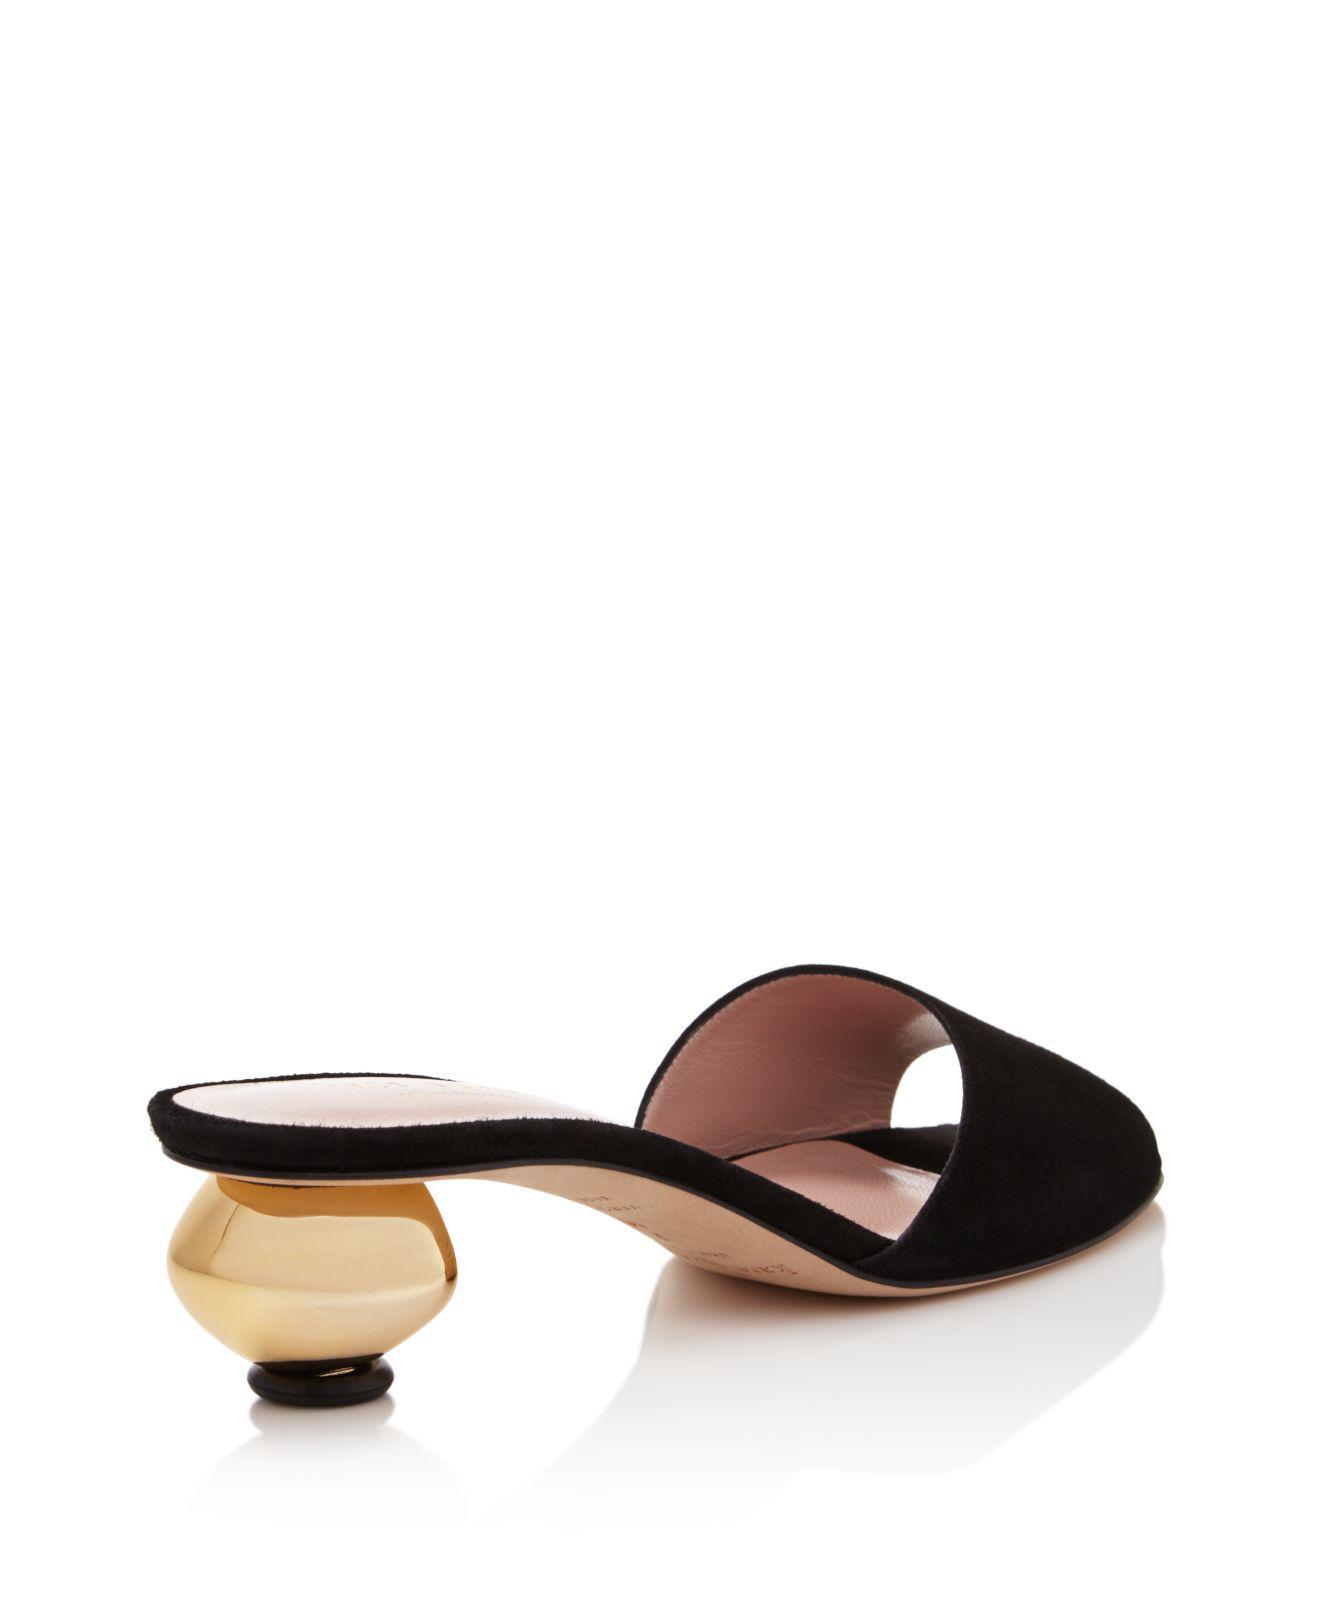 589fbf7a1a27 Kate Spade Paisley Low Heel Slide Sandals in Black - Lyst